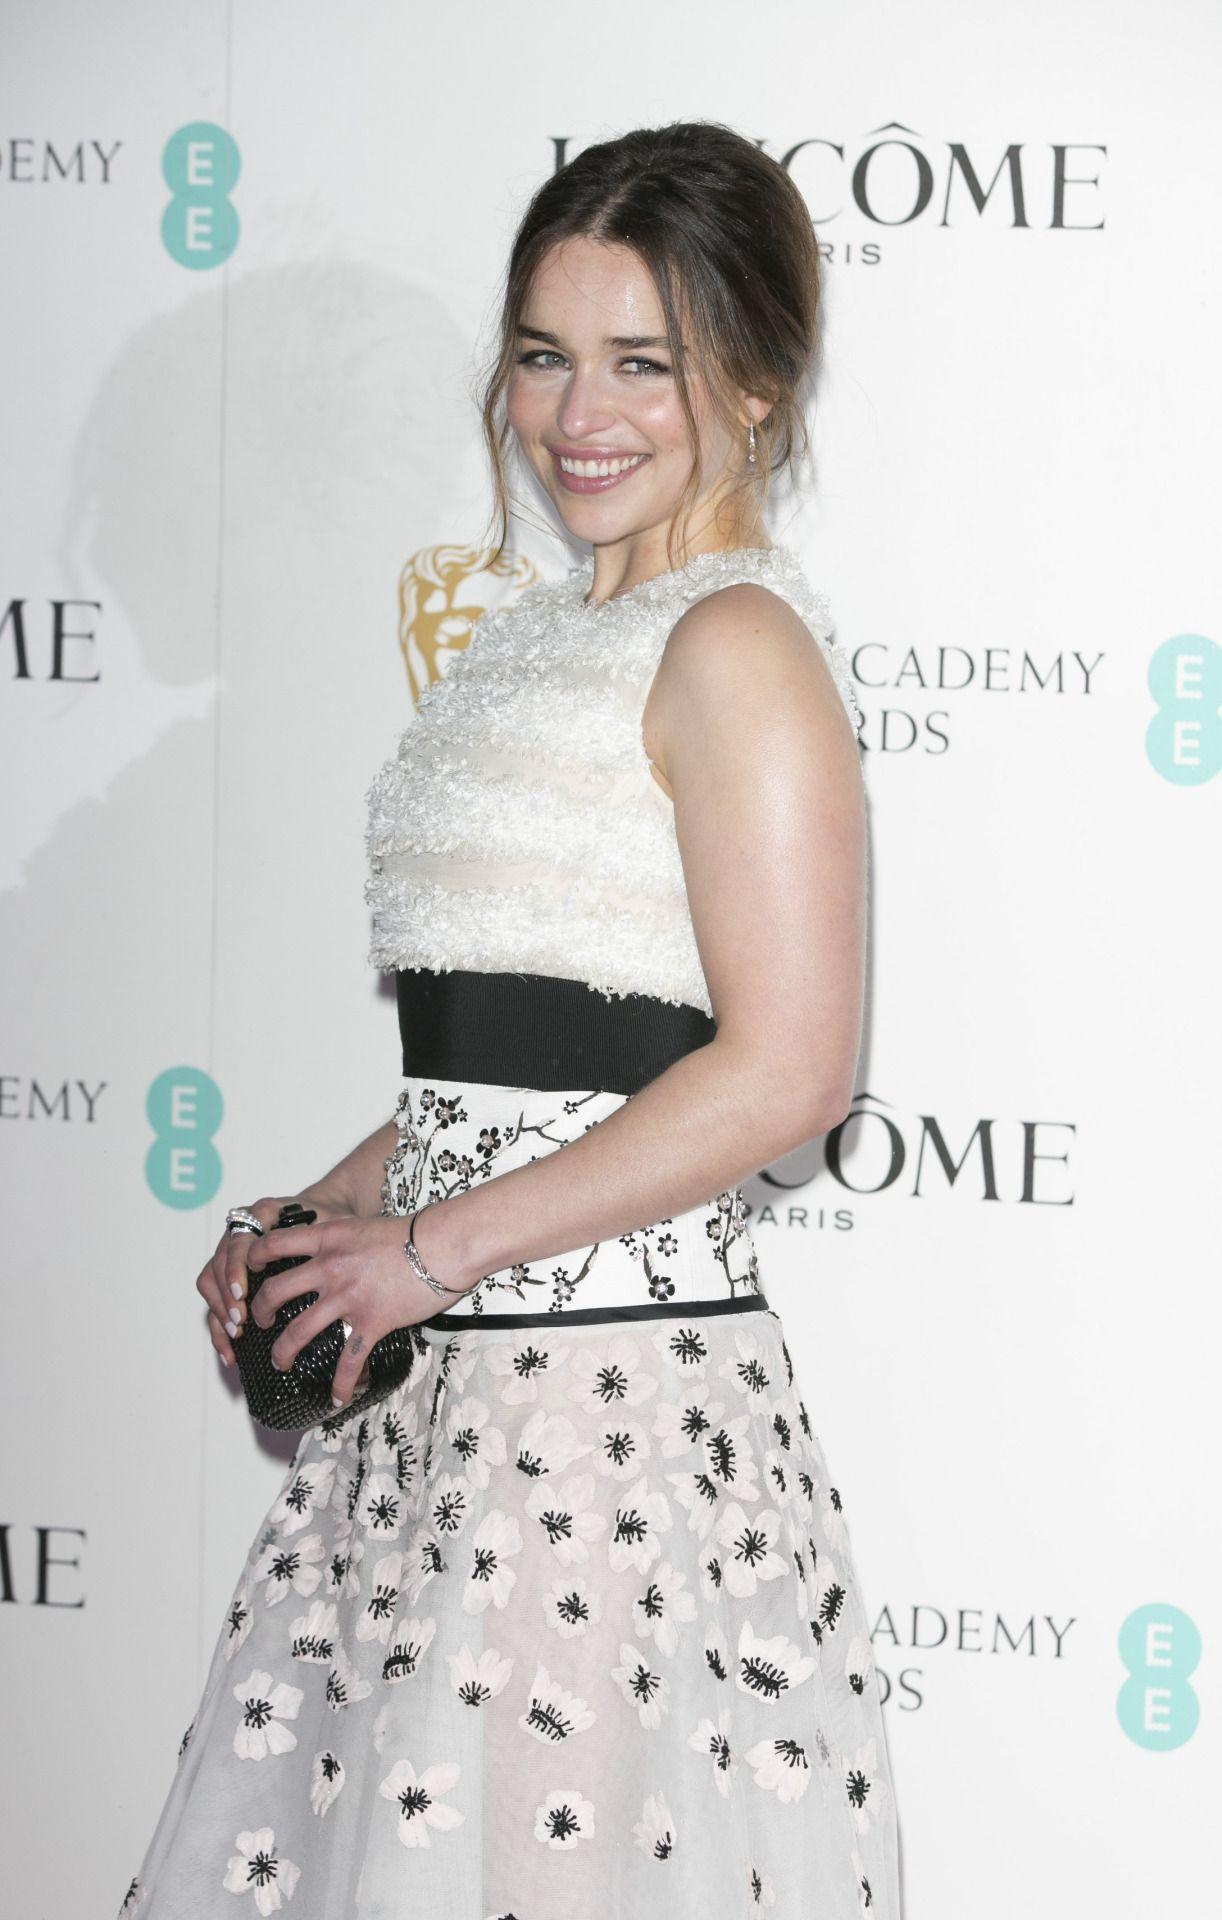 Emilia Clarke at the Lancome BAFTA nominees party, London (13 February, 2016)